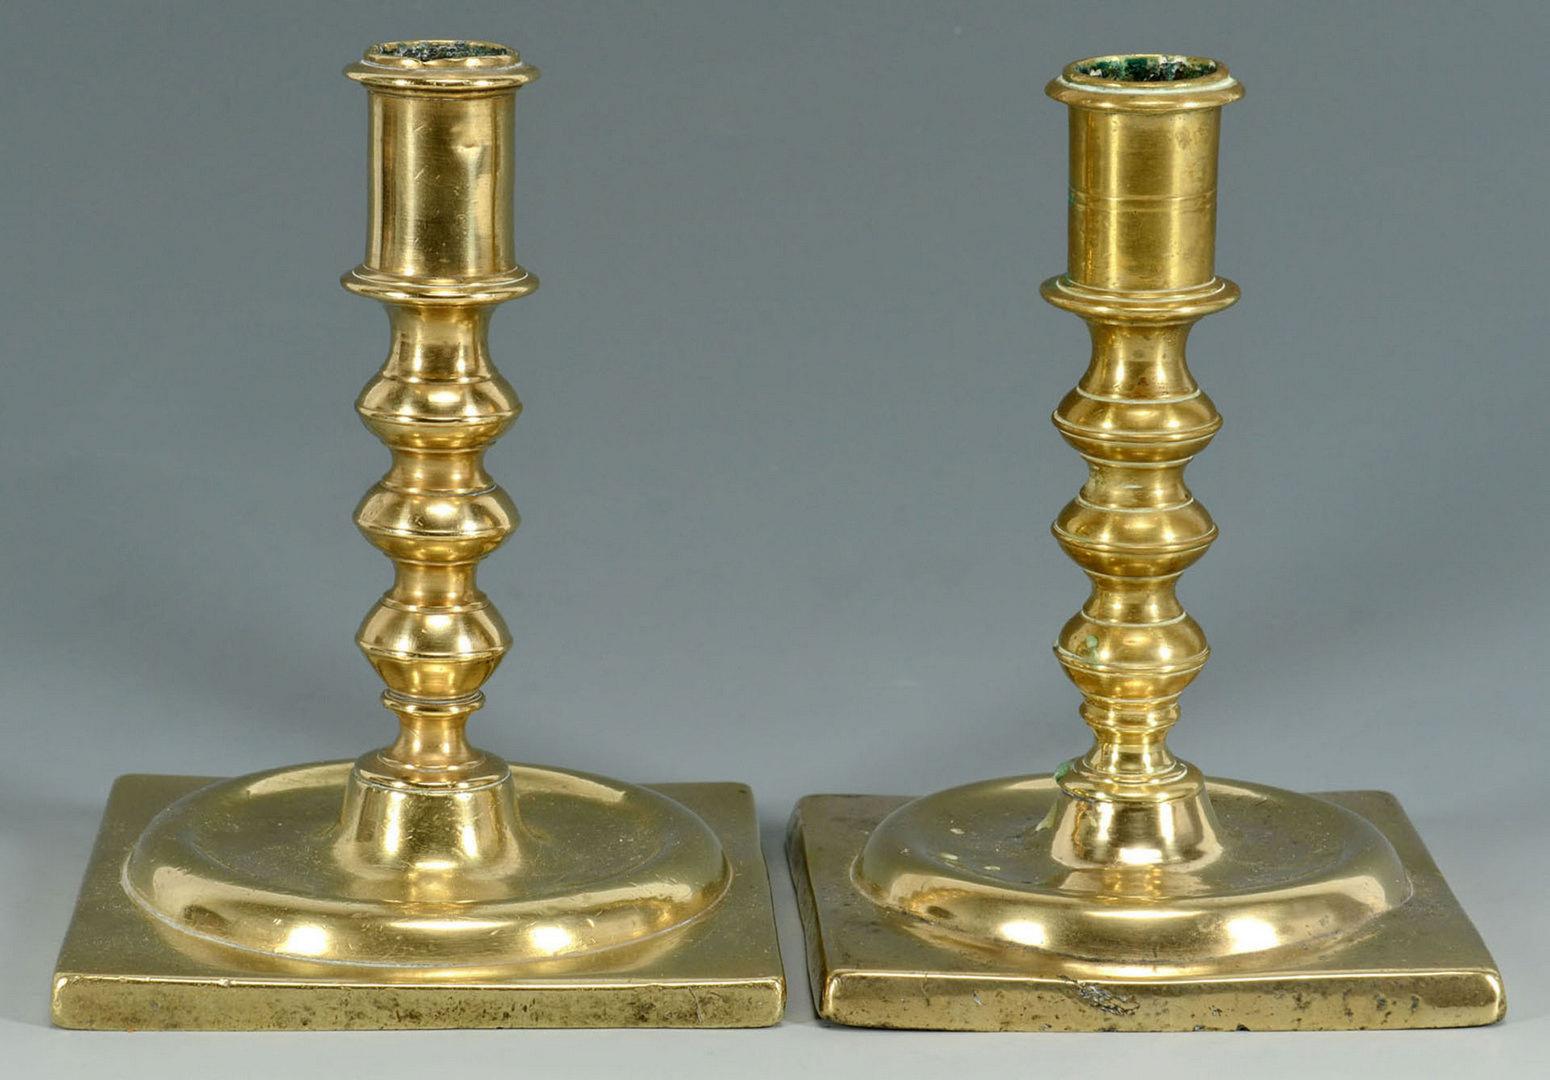 Lot 3088171: Four English Brass Candlesticks